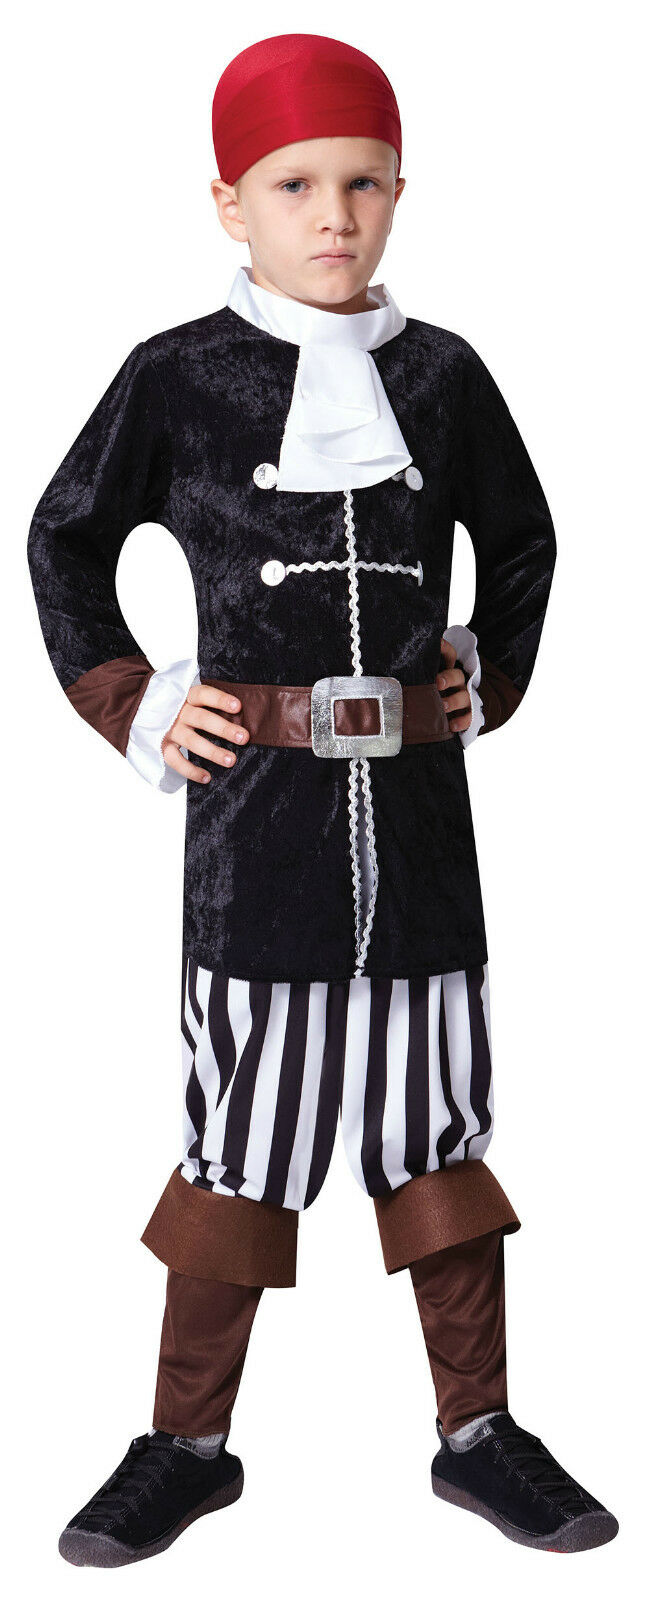 Caribbean Black Pirate Of The Seas Captain Halloween Costume For Boys